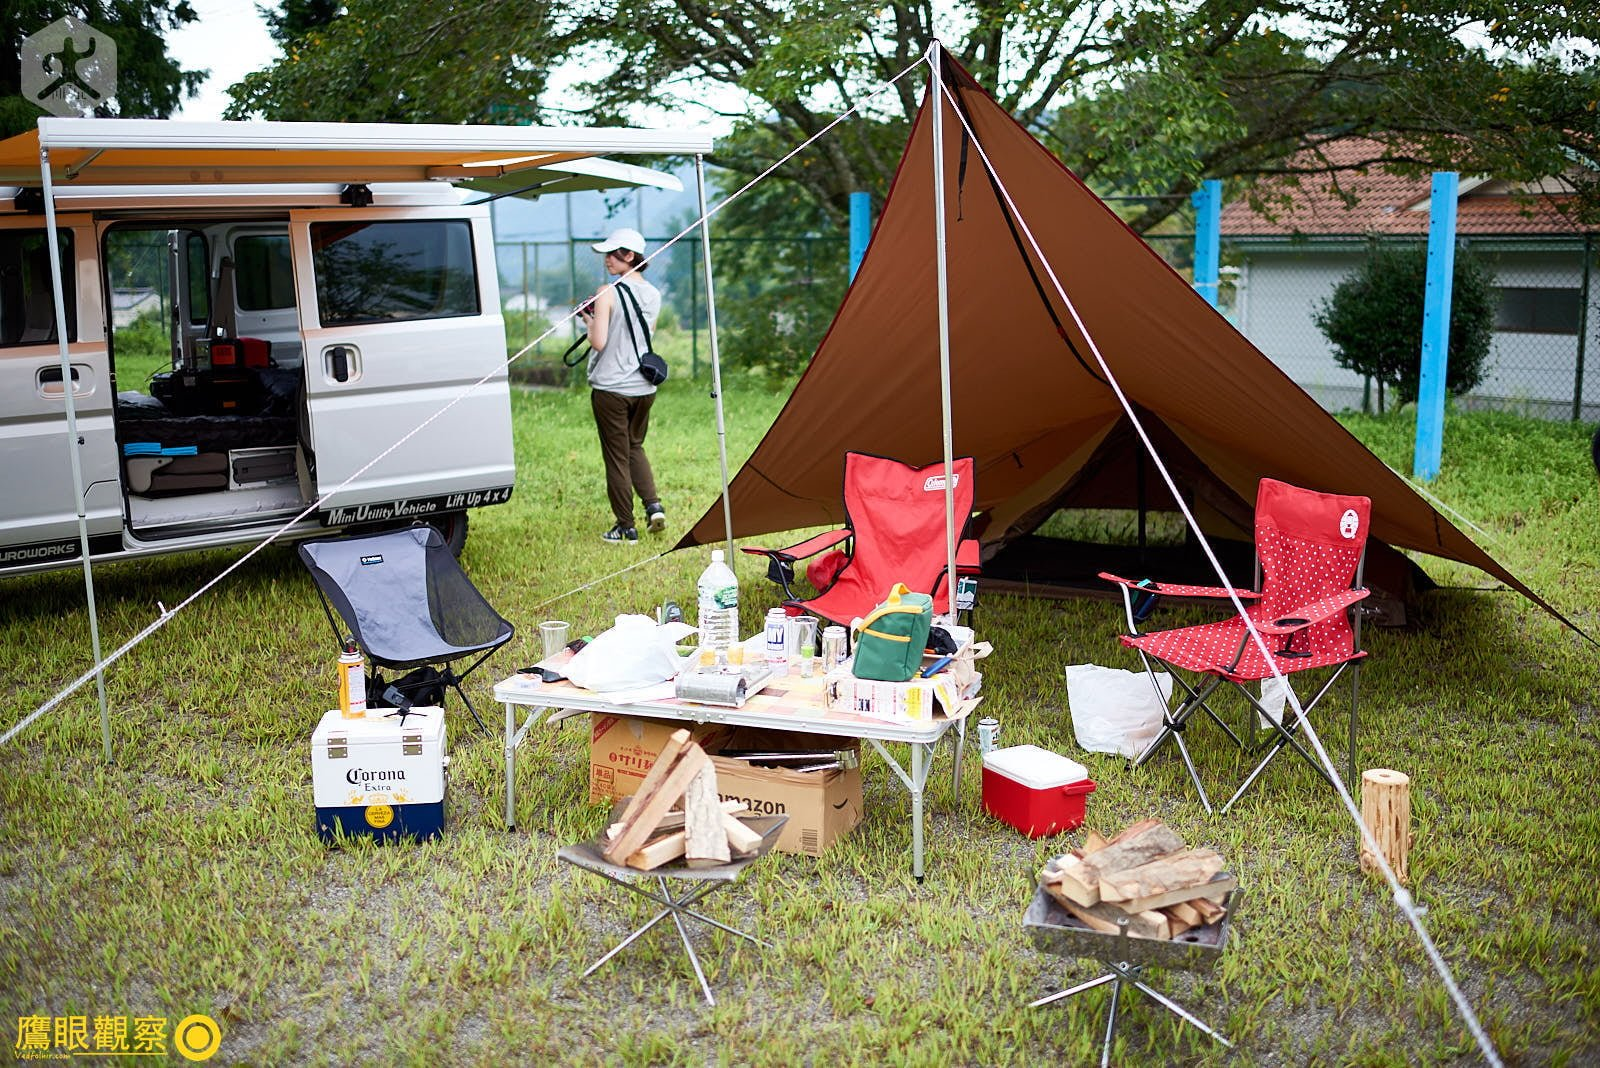 Japan Travel RV Camper Tent 20190817150928 日本廢棄小學 🚗 RV 休旅車露營、森林探險之旅(櫪木縣鹿沼市立久我小學)🇯🇵⛺️